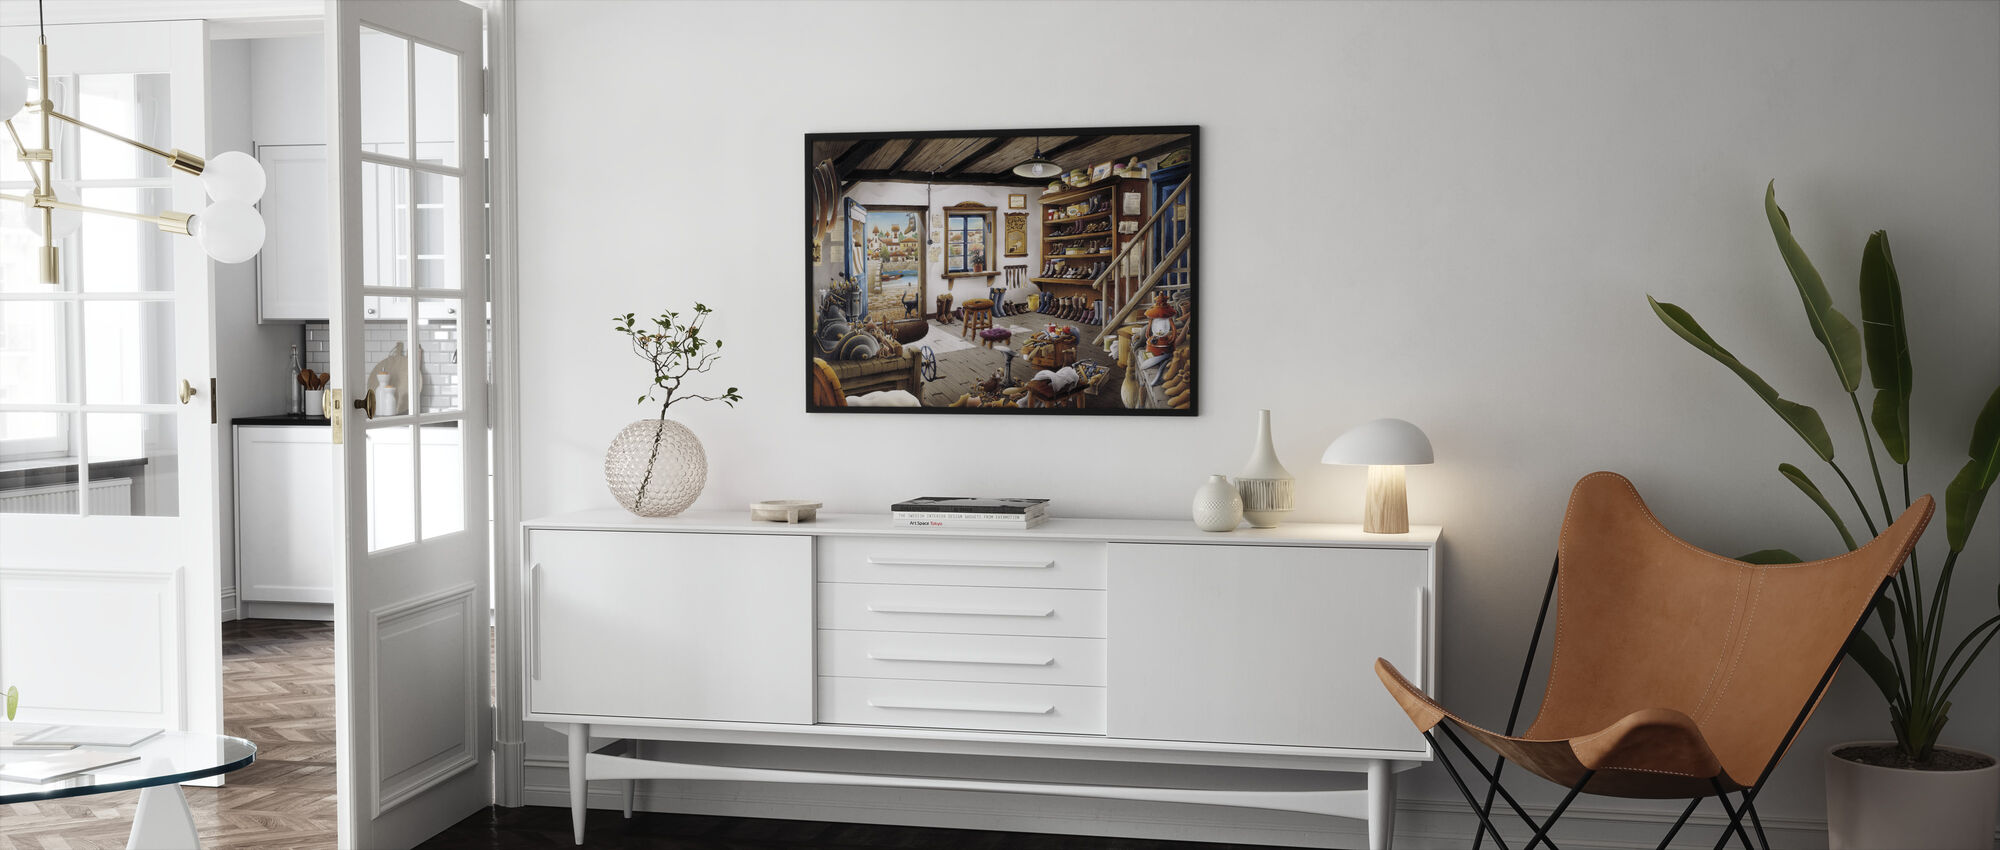 The Cobbler Shop - Framed print - Living Room